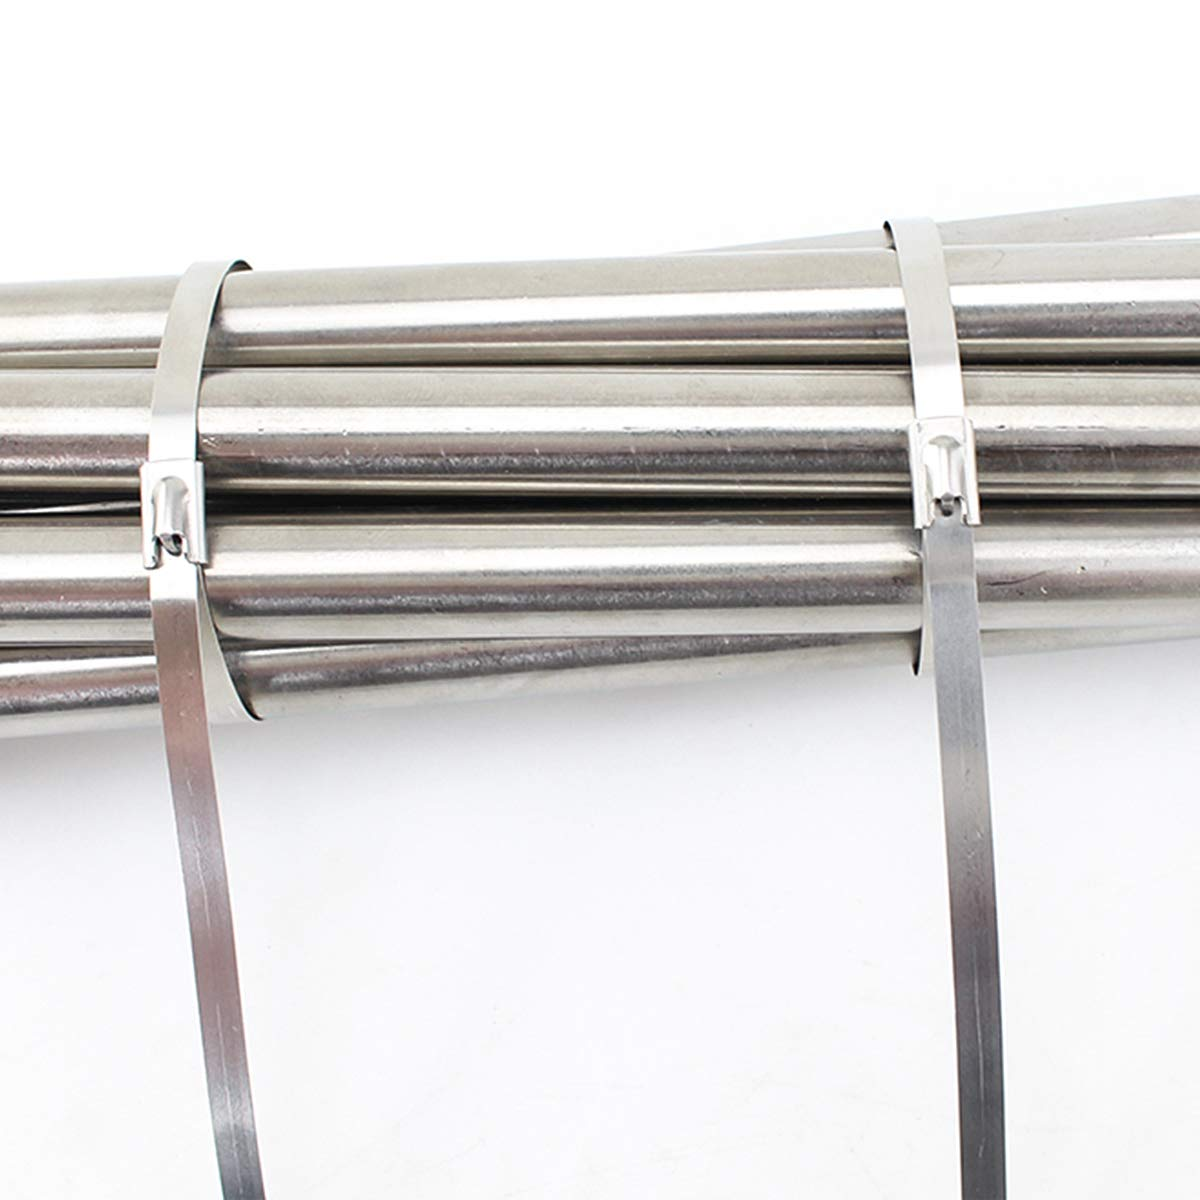 SS304 Stainless Steel Zip Ties Metal Cable Ties Exhaust Wrap Coated Locking Cable Zip Ties 316 Marine Grade Metal Tie Wraps NATUCE 100PCS 4.6 * 300mm Premium Stainless Steel Cable Ties